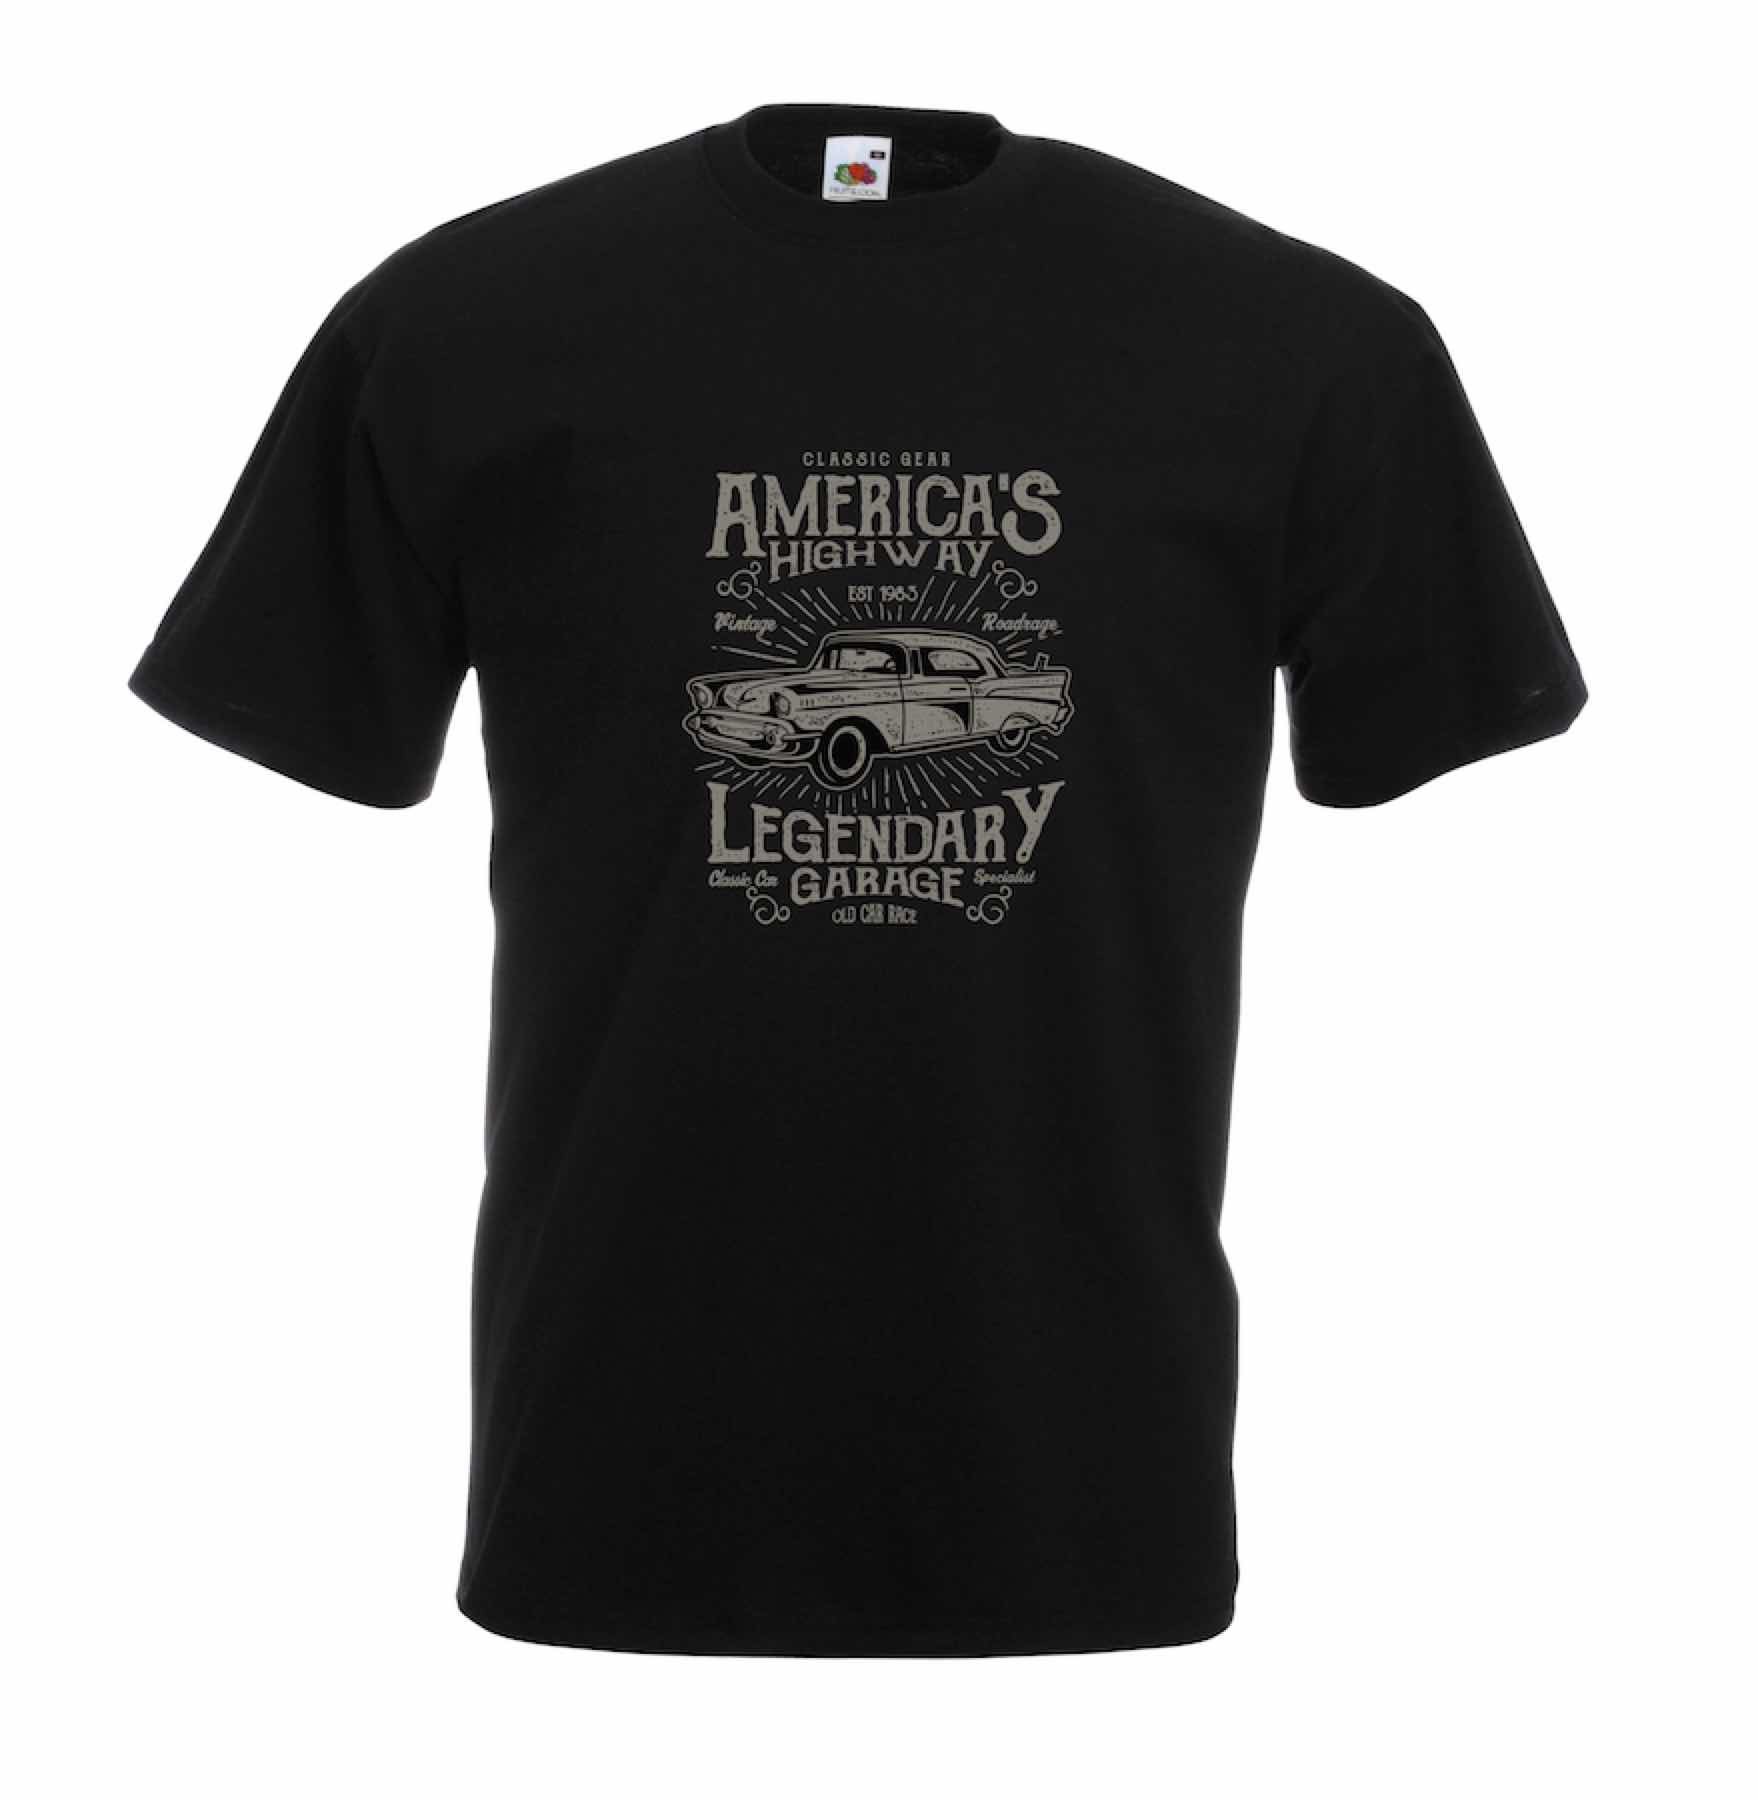 America's Highway design for t-shirt, hoodie & sweatshirt